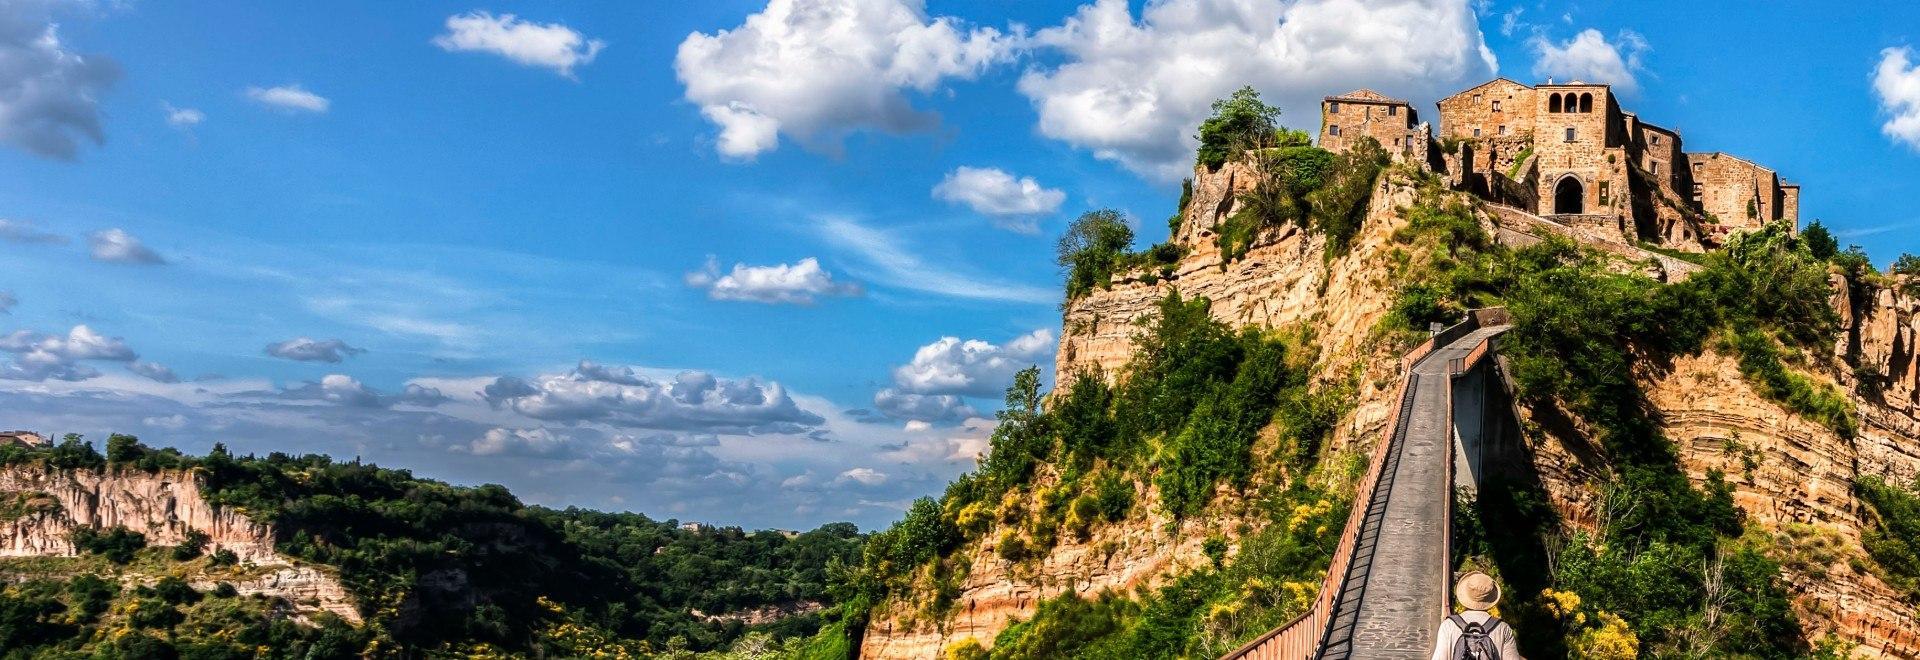 Sicilia: la casa del poeta